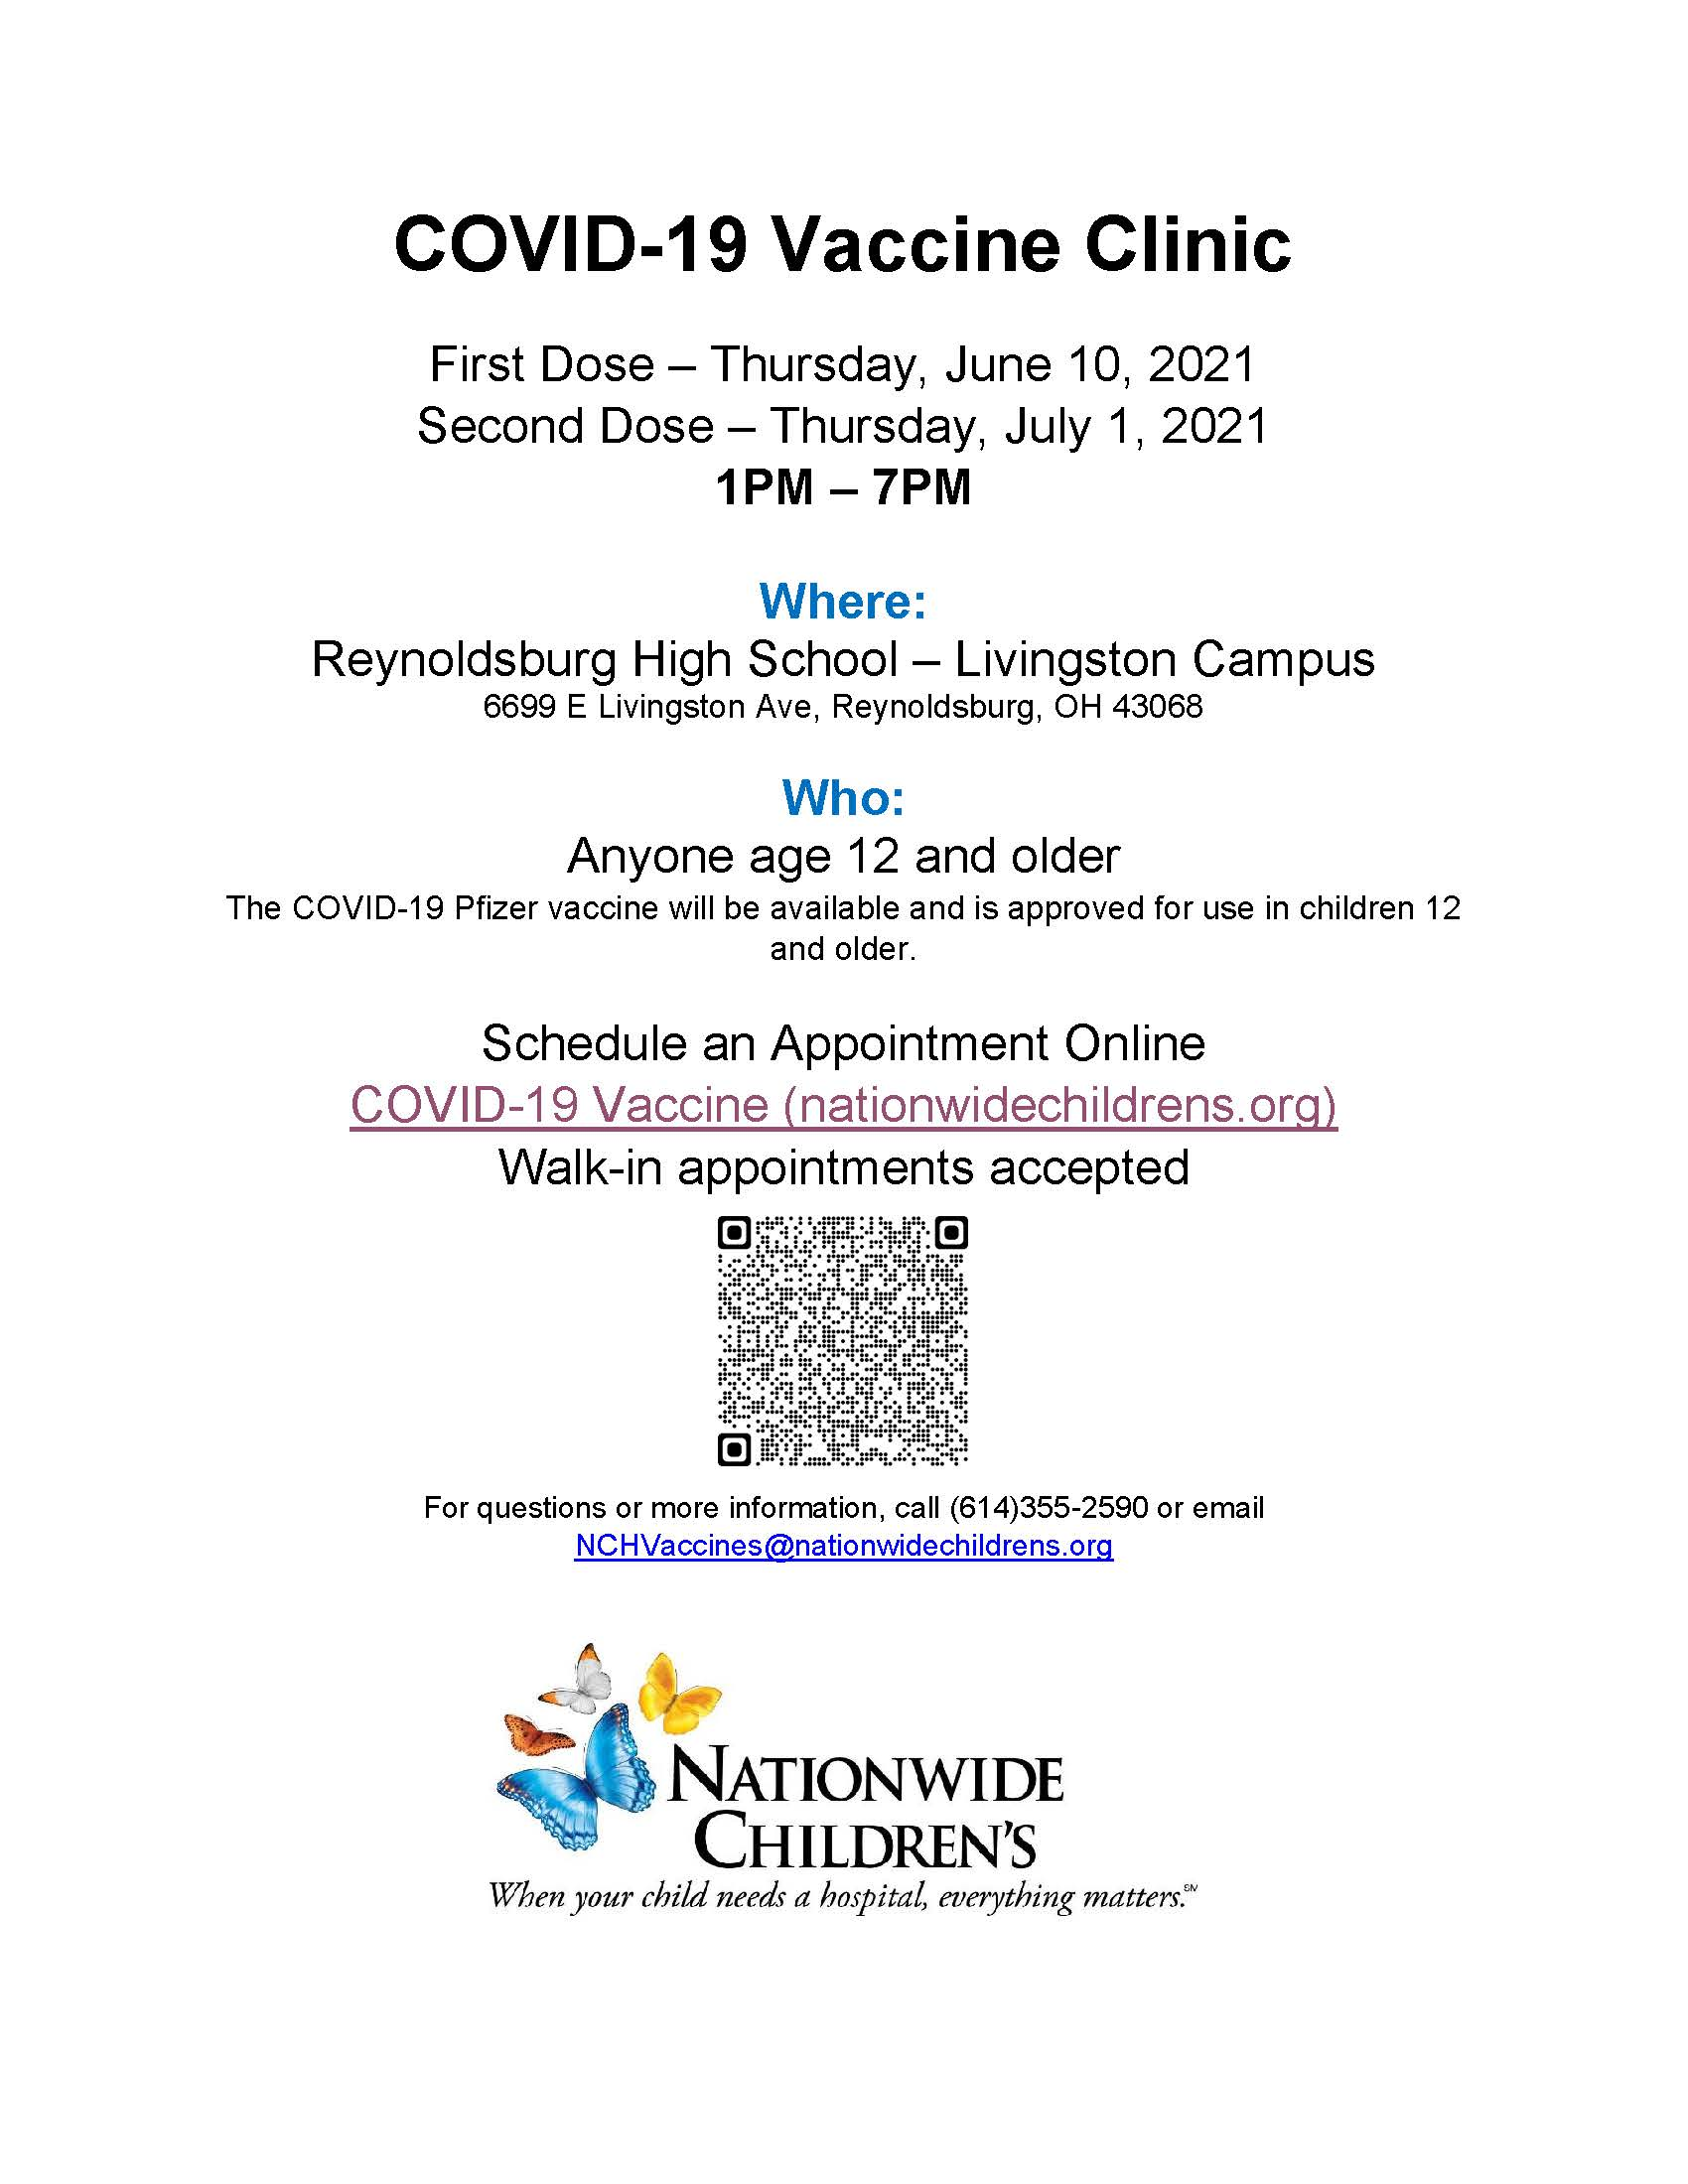 NCH Vaccine Clinic